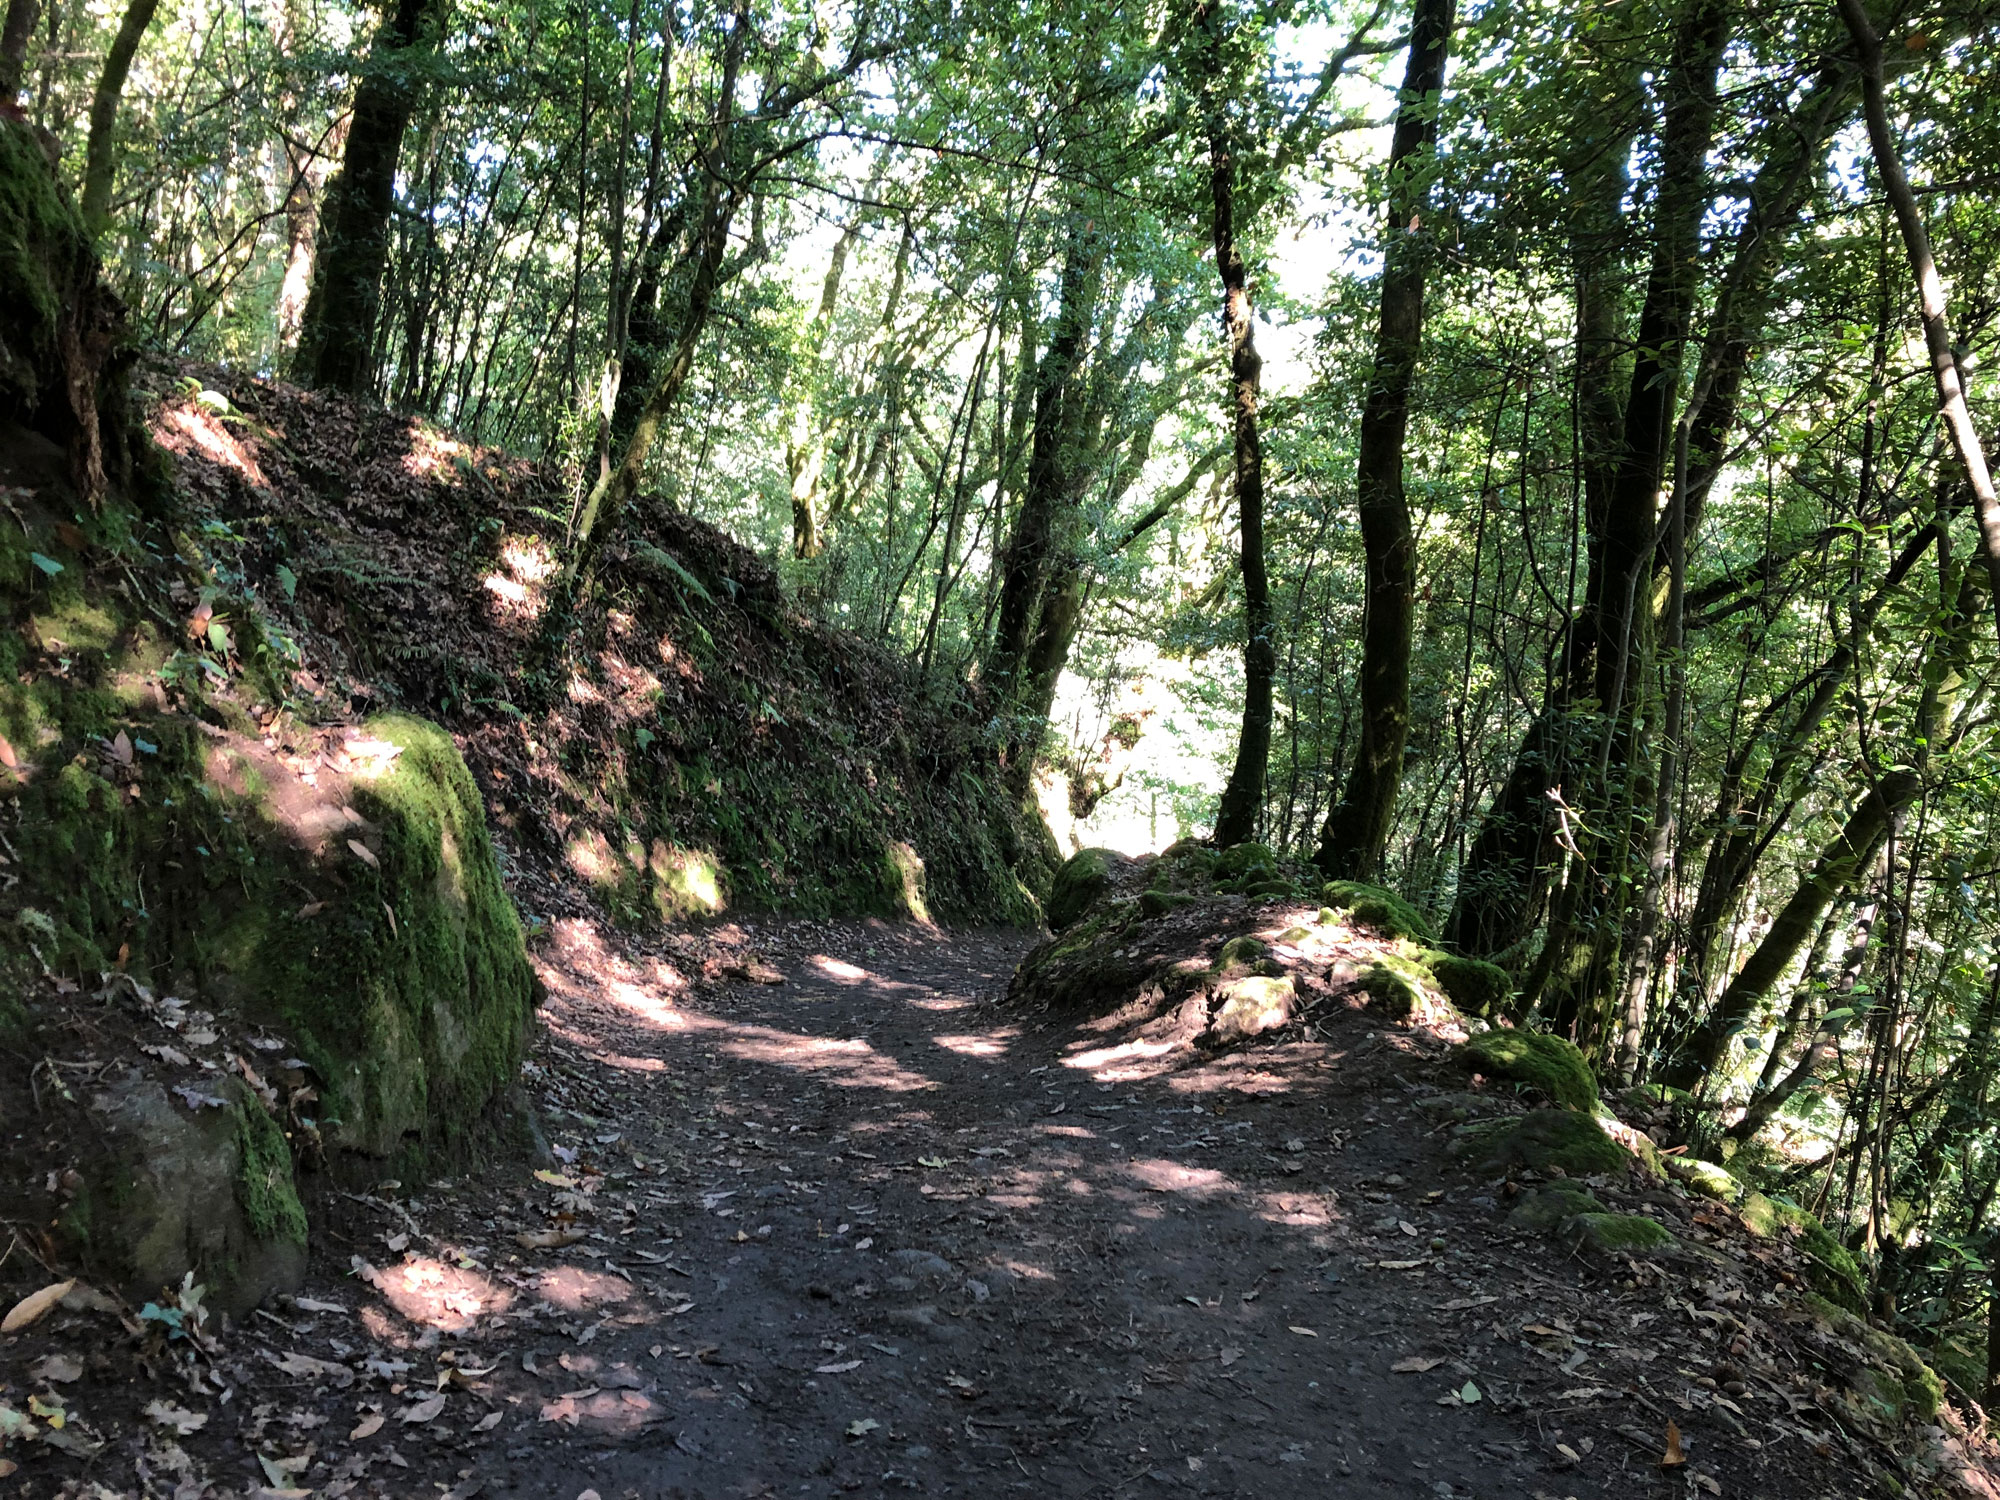 Pilgerweg im Wald